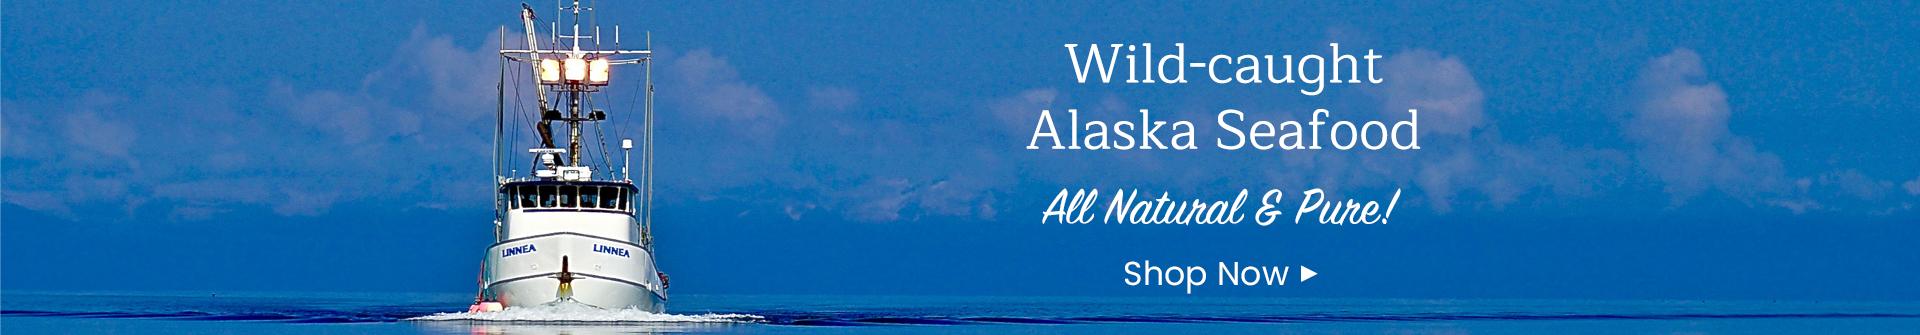 Wild-caught Alaska Seafood3